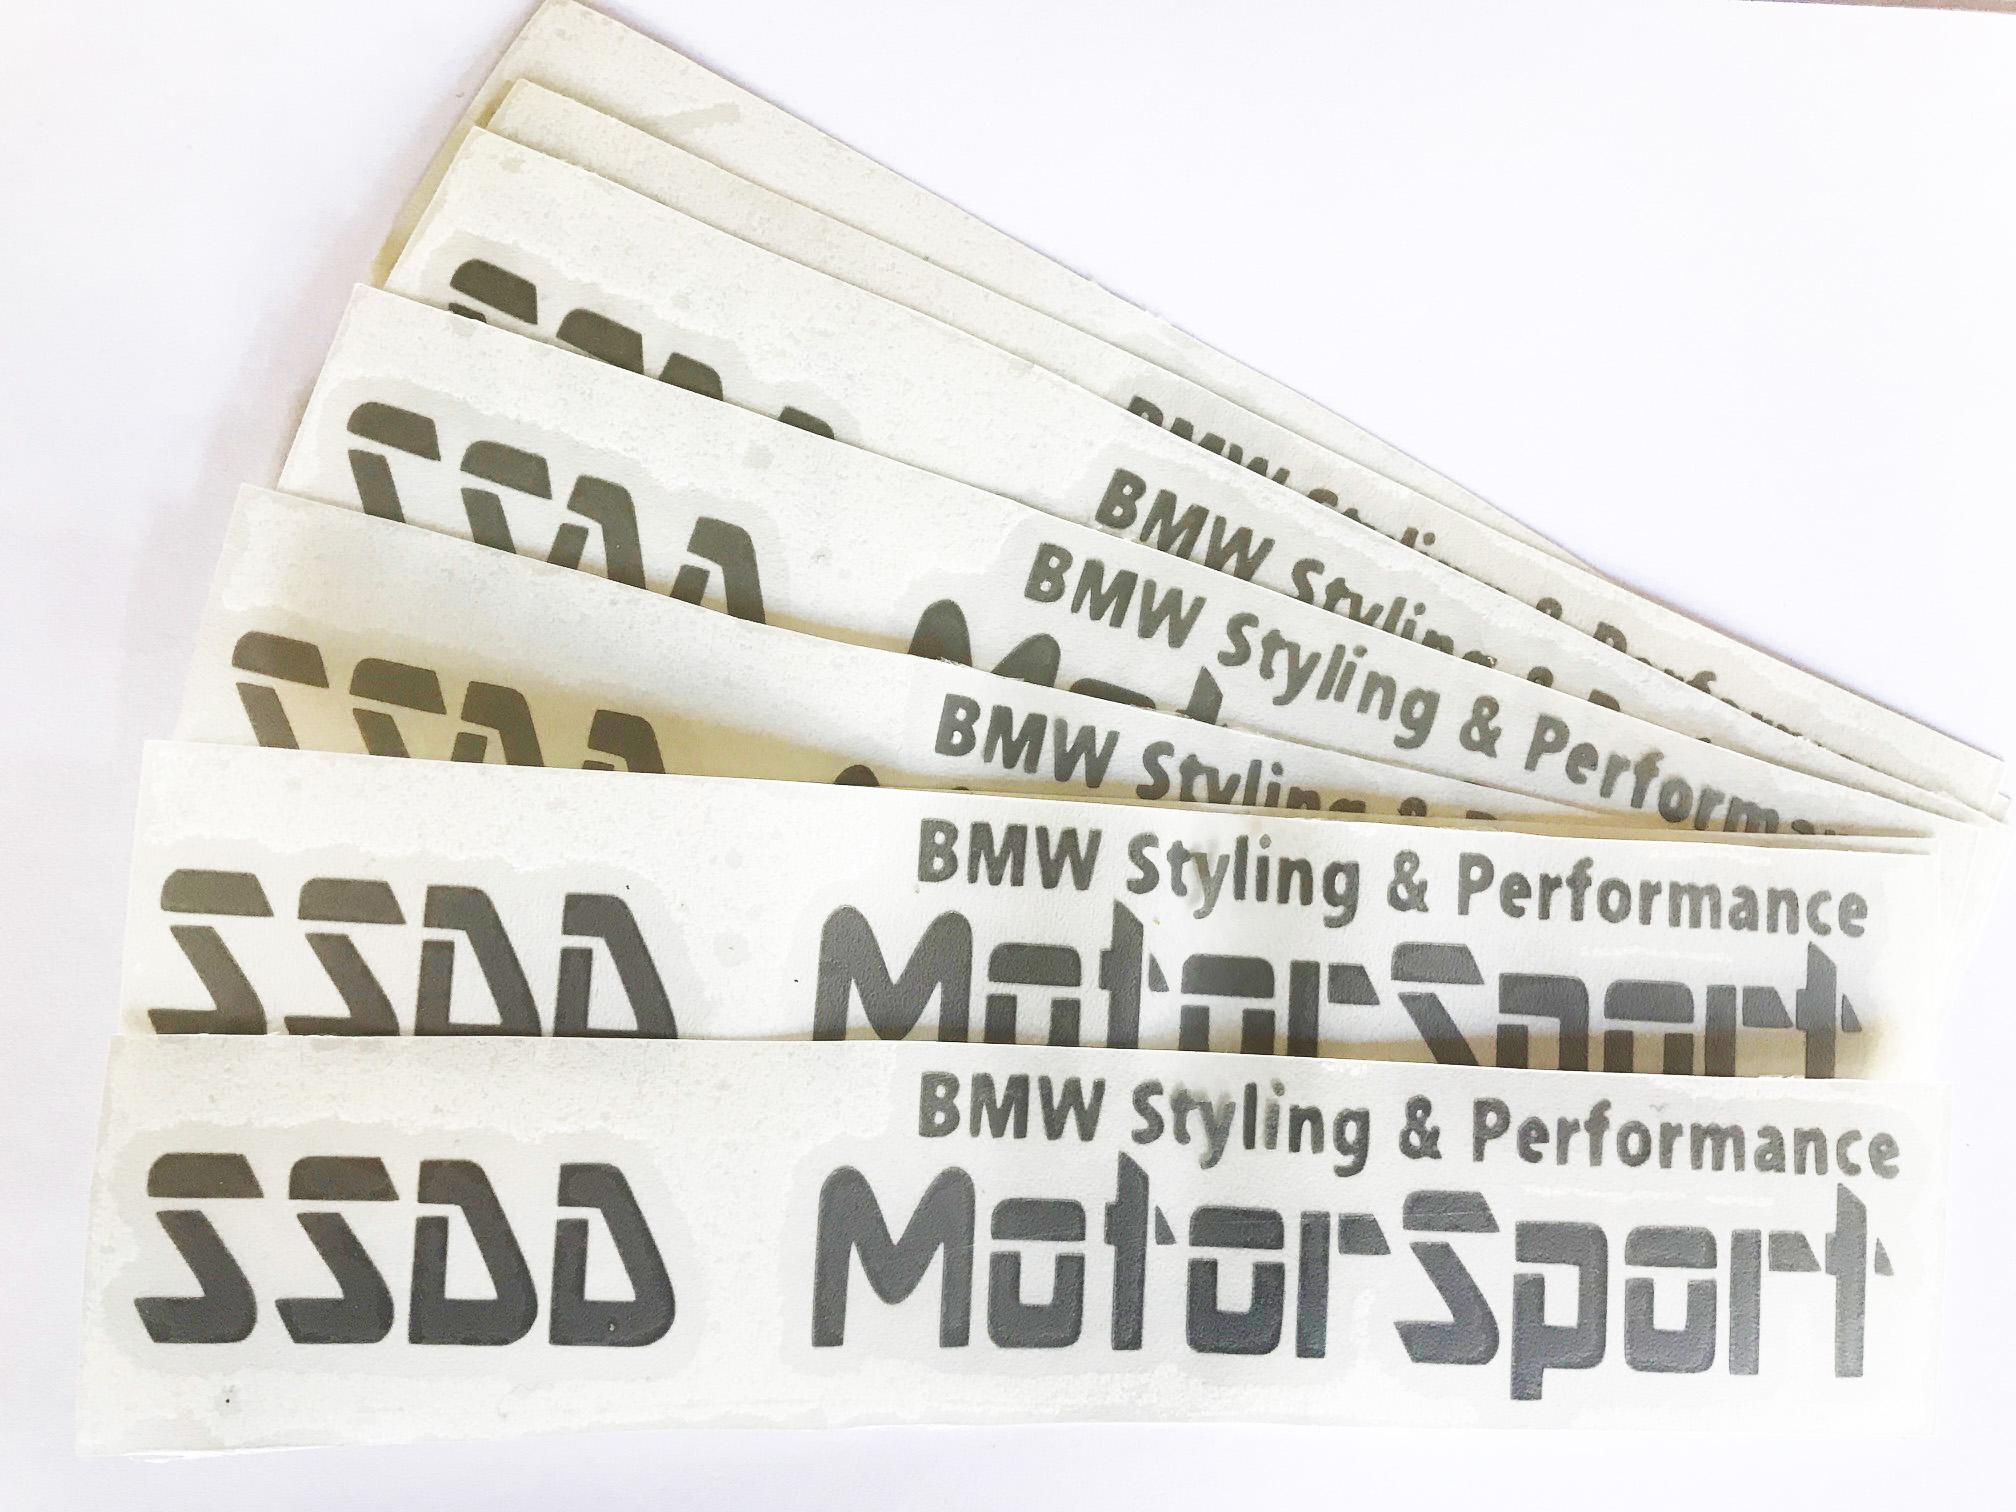 ssdd-motorsport-stickers.jpg